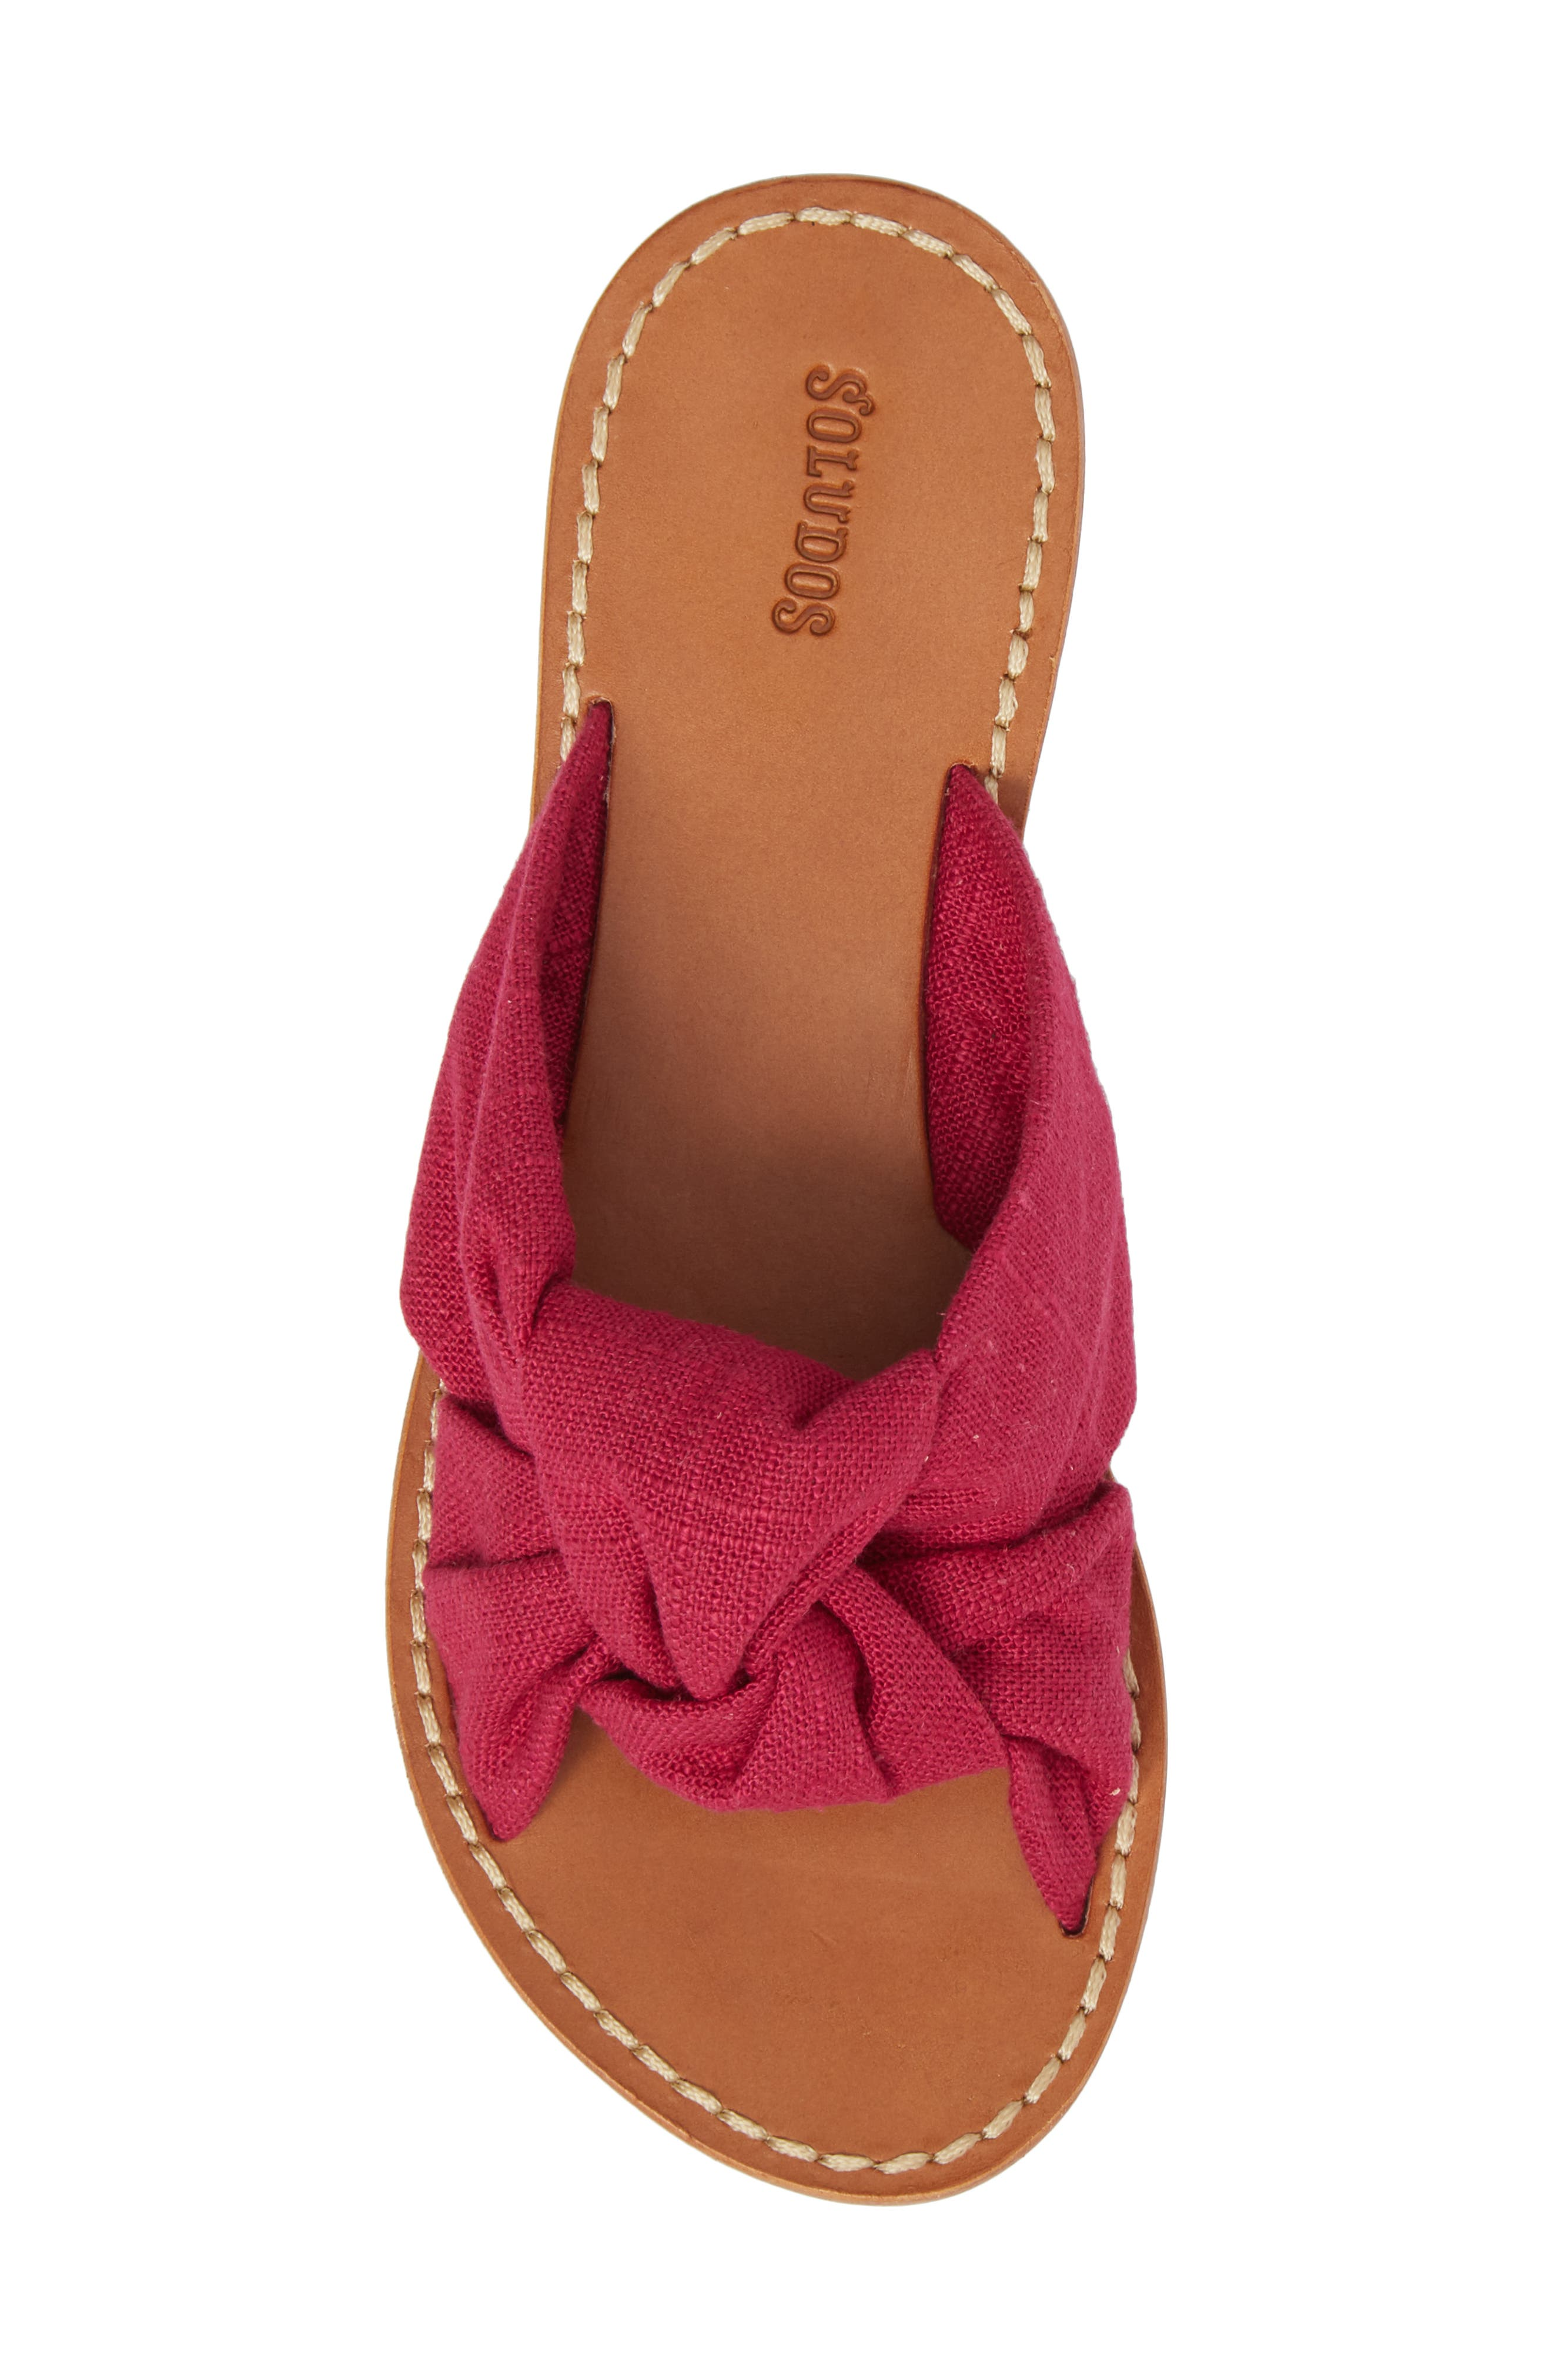 Knotted Slide Sandal,                             Alternate thumbnail 5, color,                             652